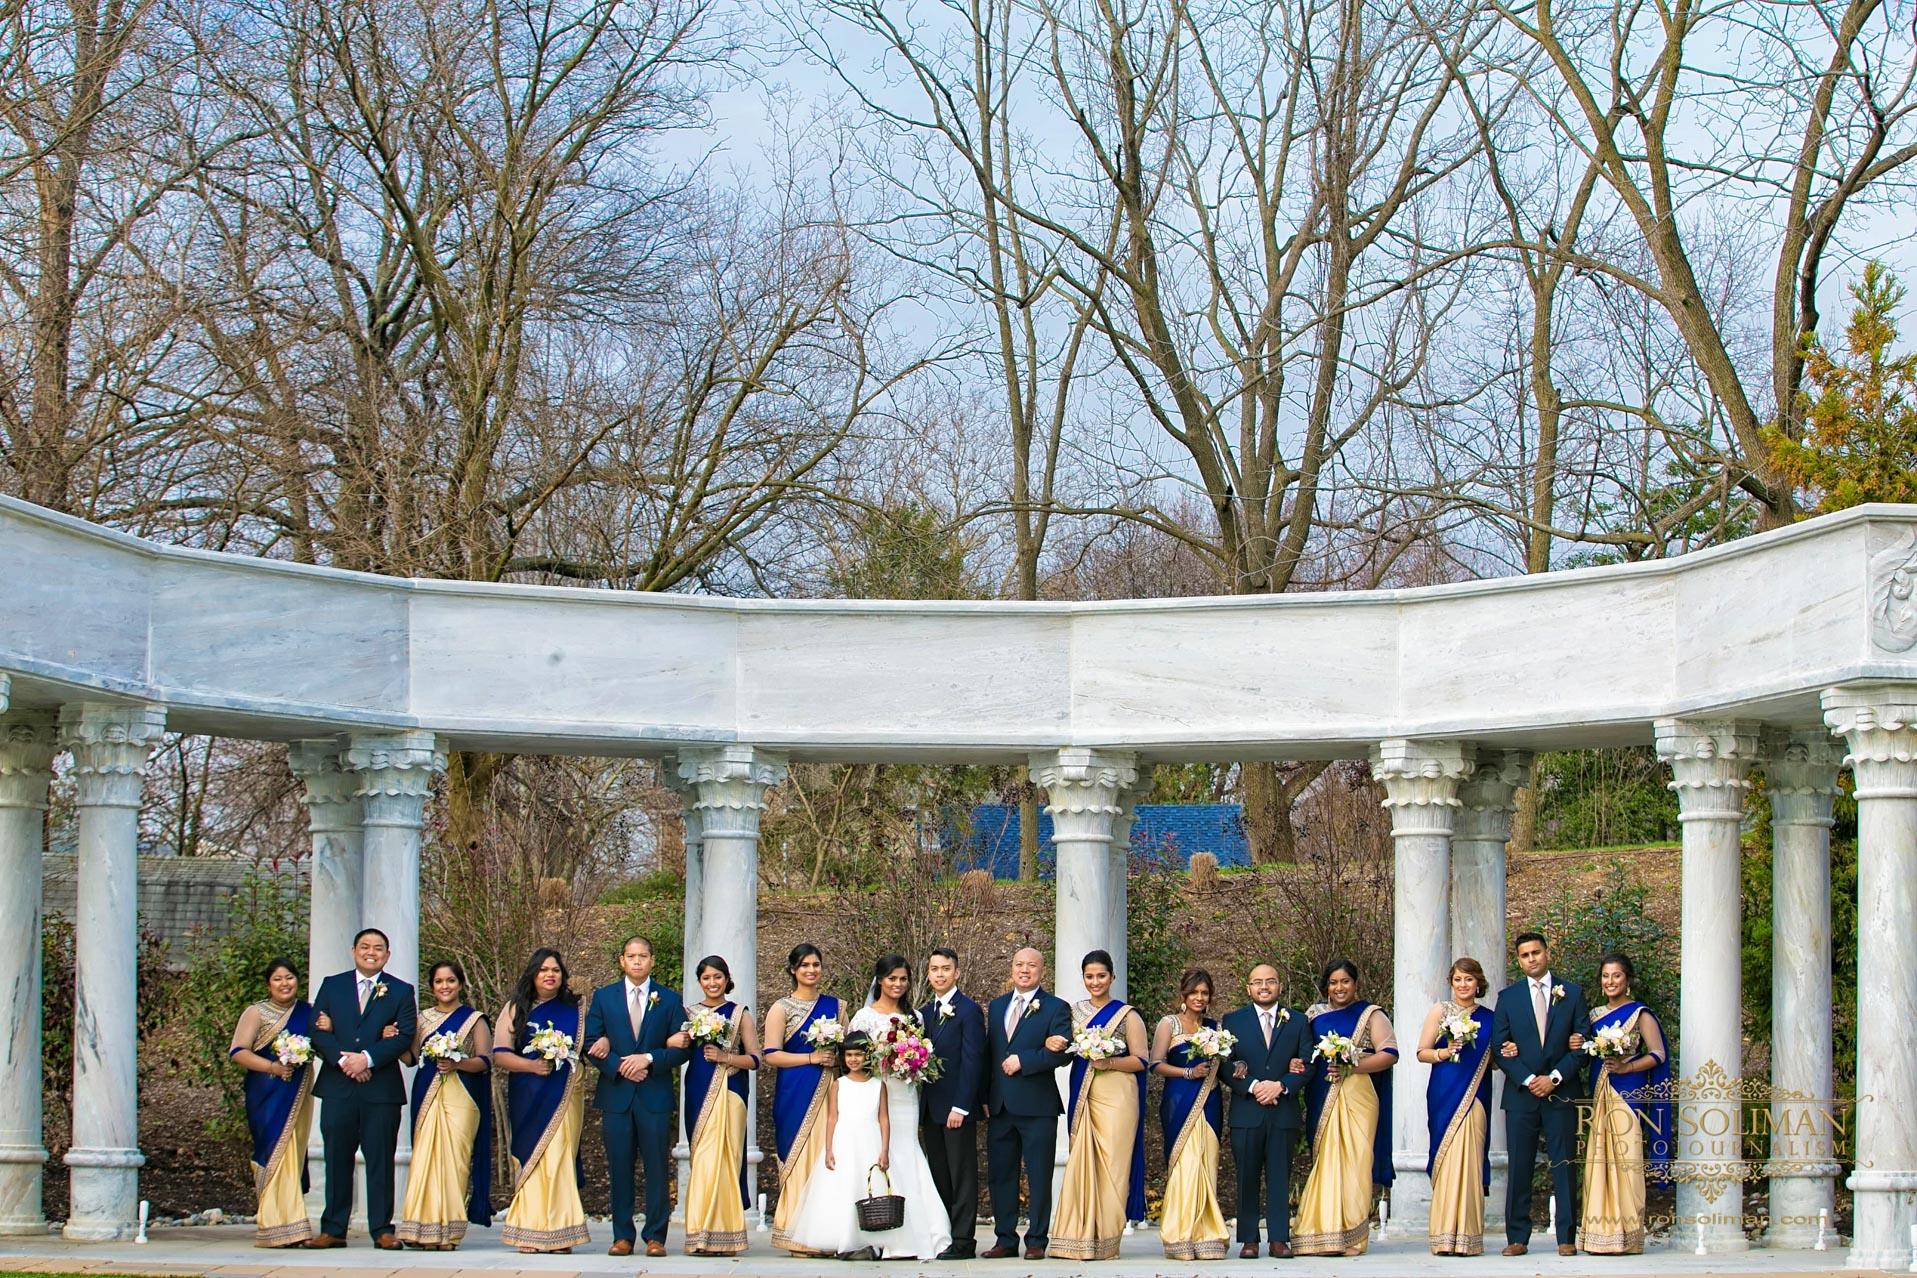 Best Waterfall wedding photos